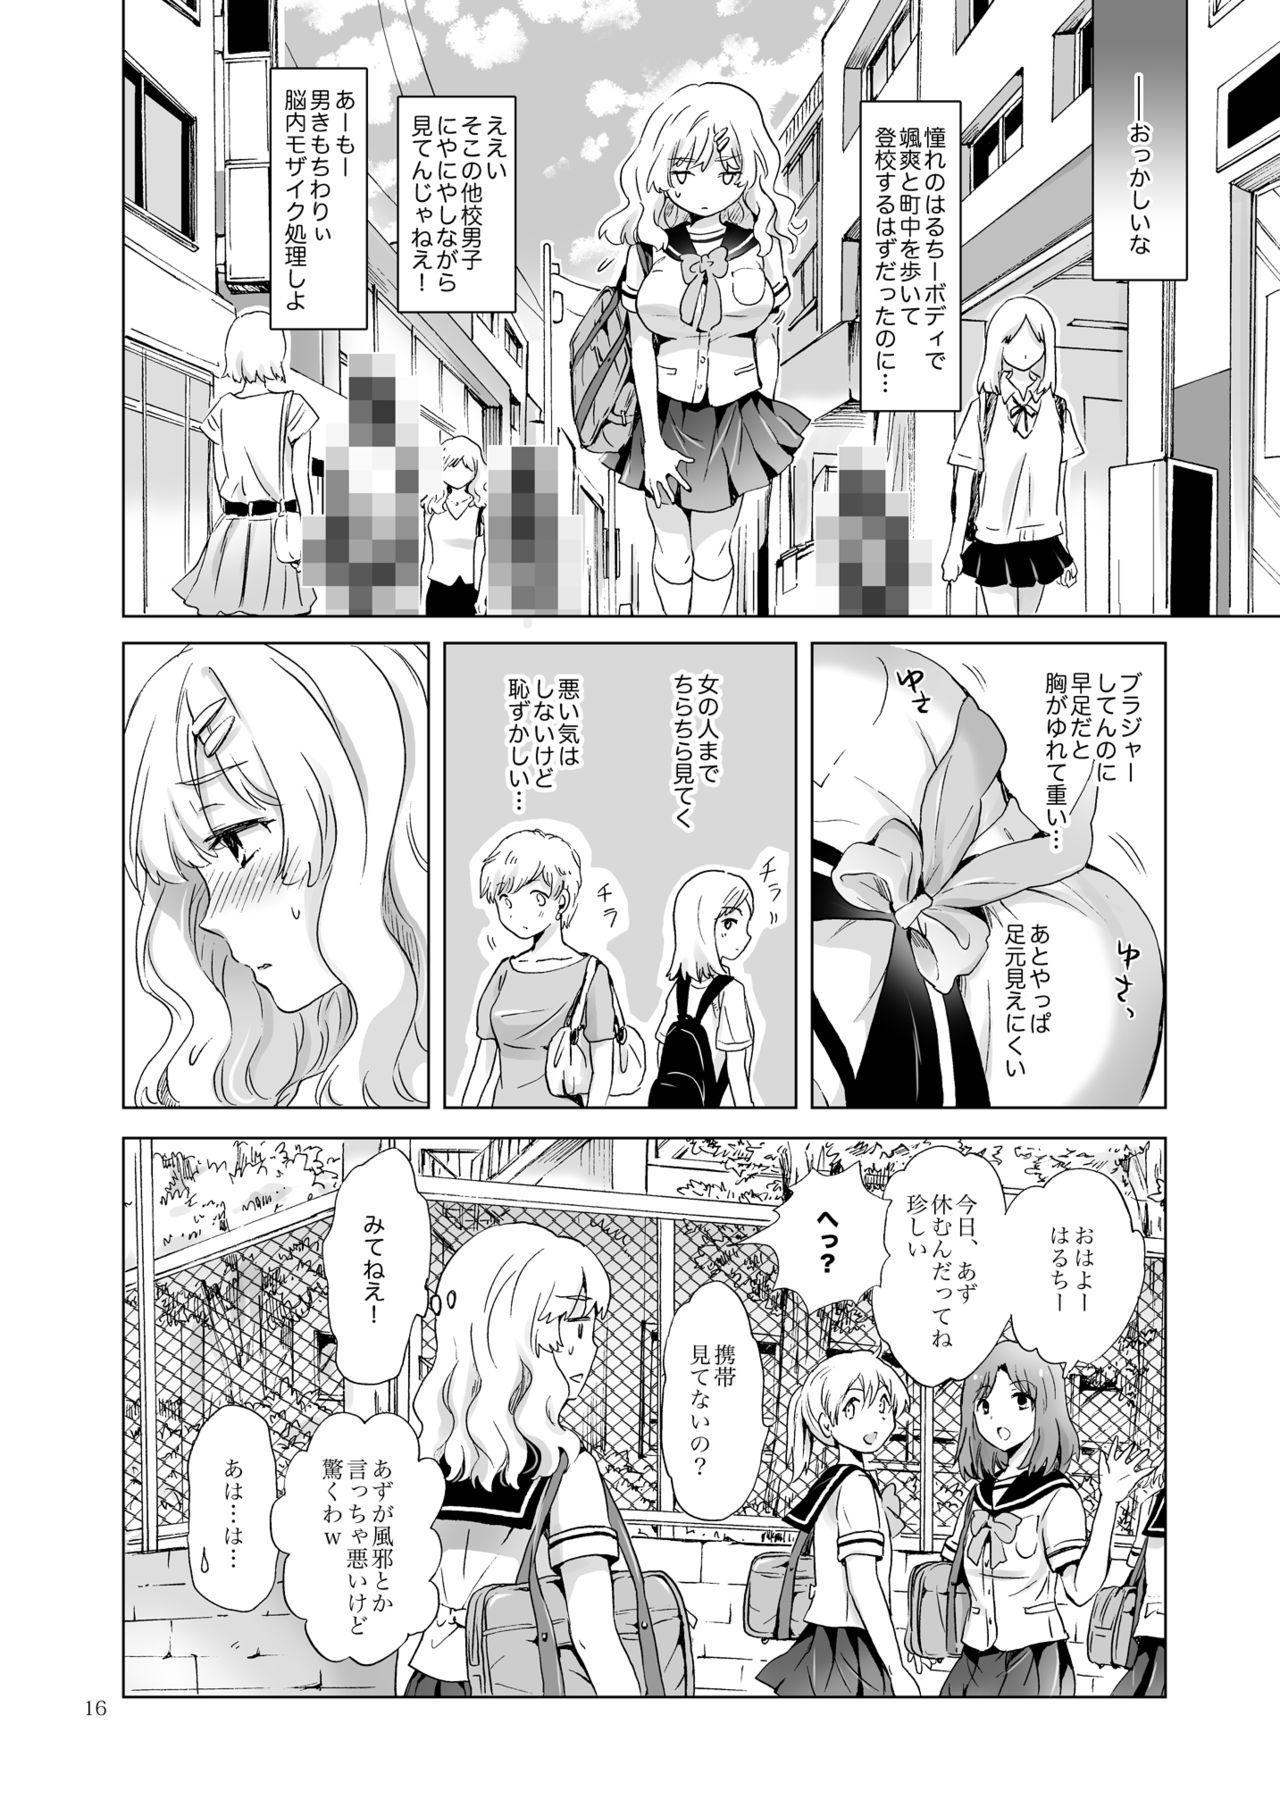 [peachpulsar (Mira)] Oppai-chan to chippai-chan ga irekawaru hanashi [Digital] 14